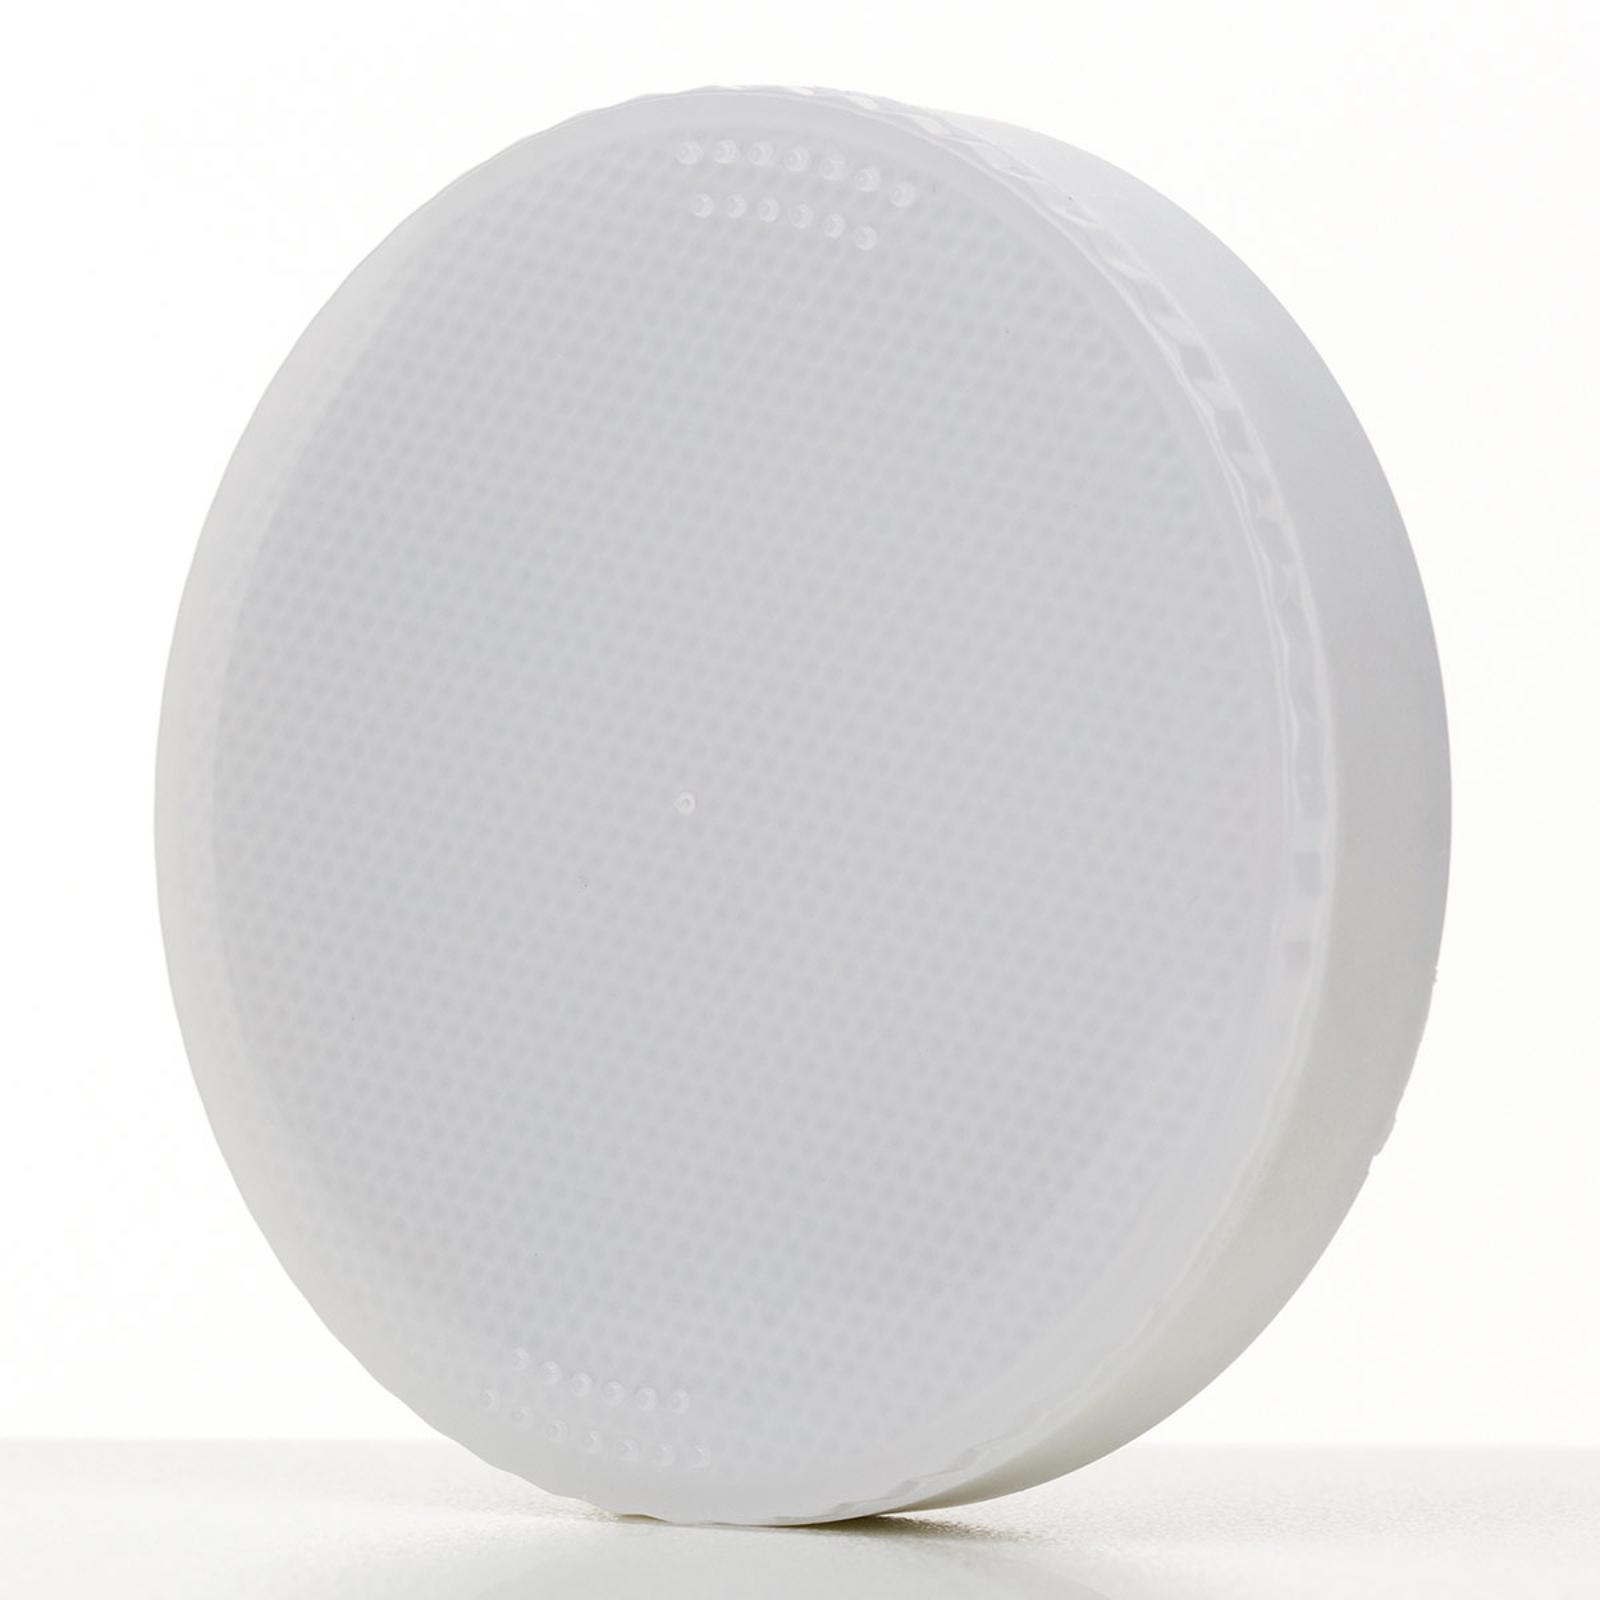 LED-pære GX53 7 W, varmhvit, dimbar